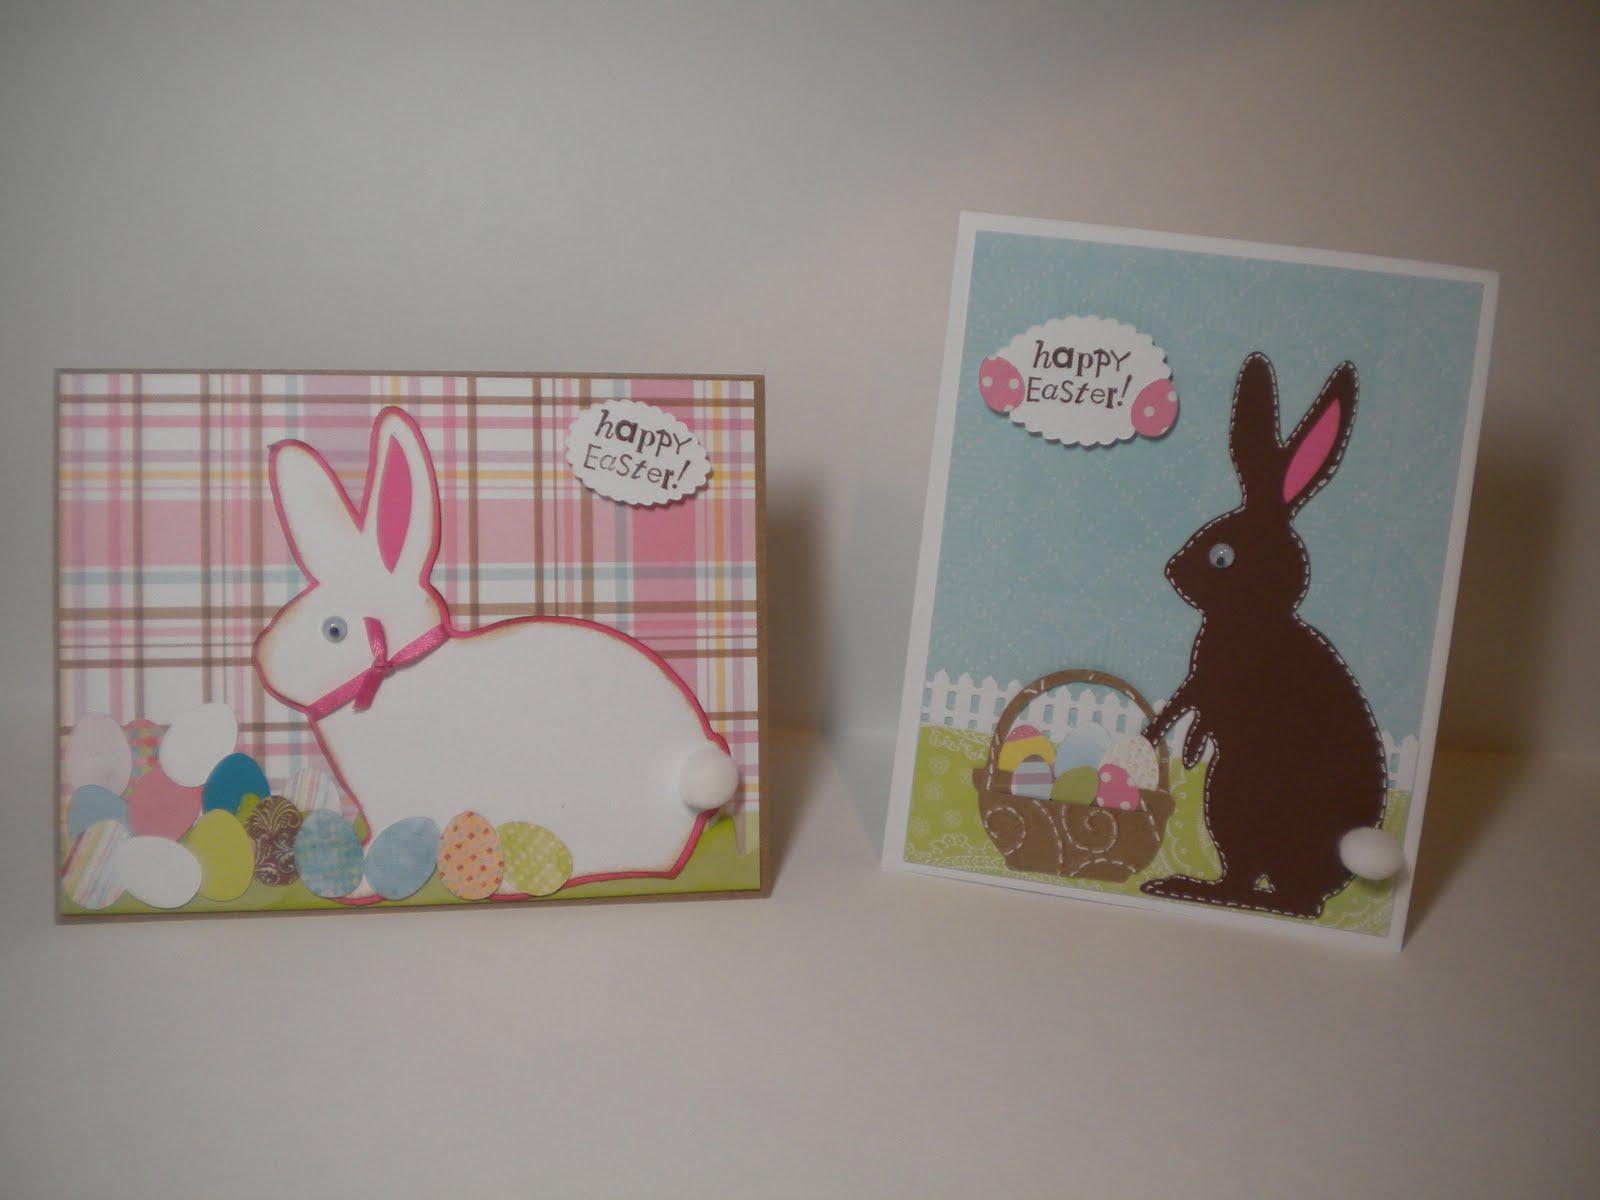 creative cricut designs  more happy easter cards